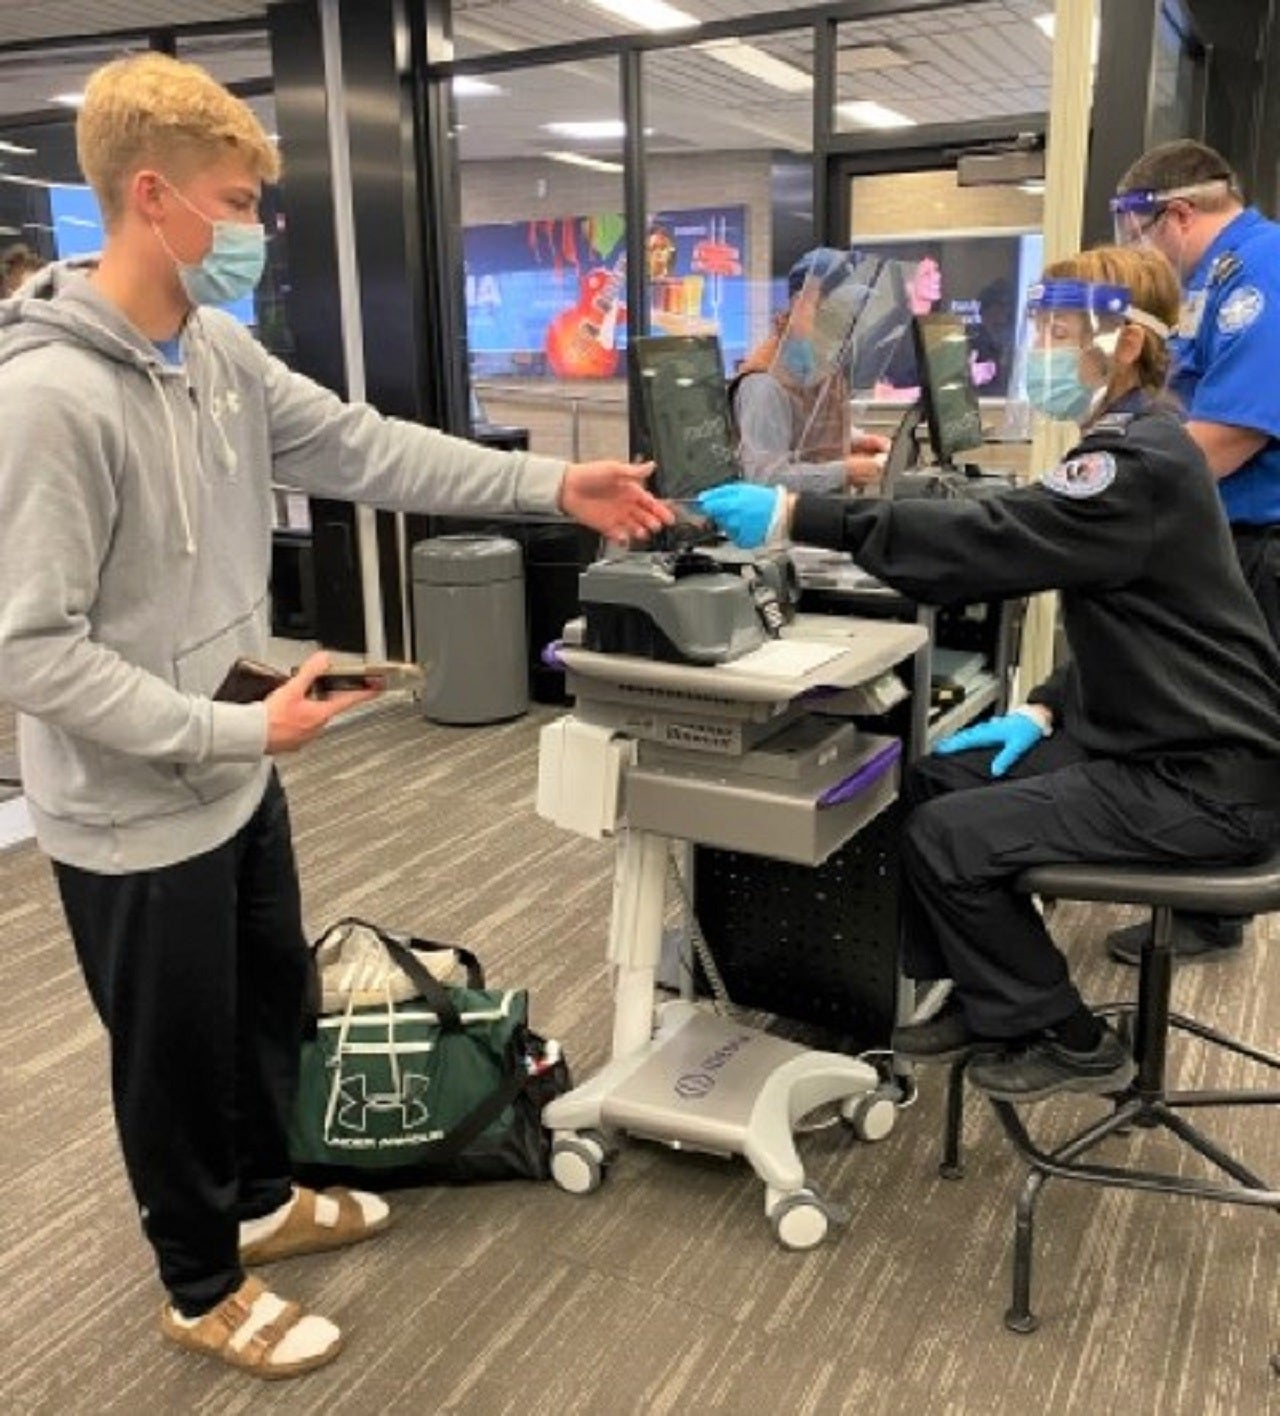 TSA at Eppley Airfield Airport in US deploys CAT unit